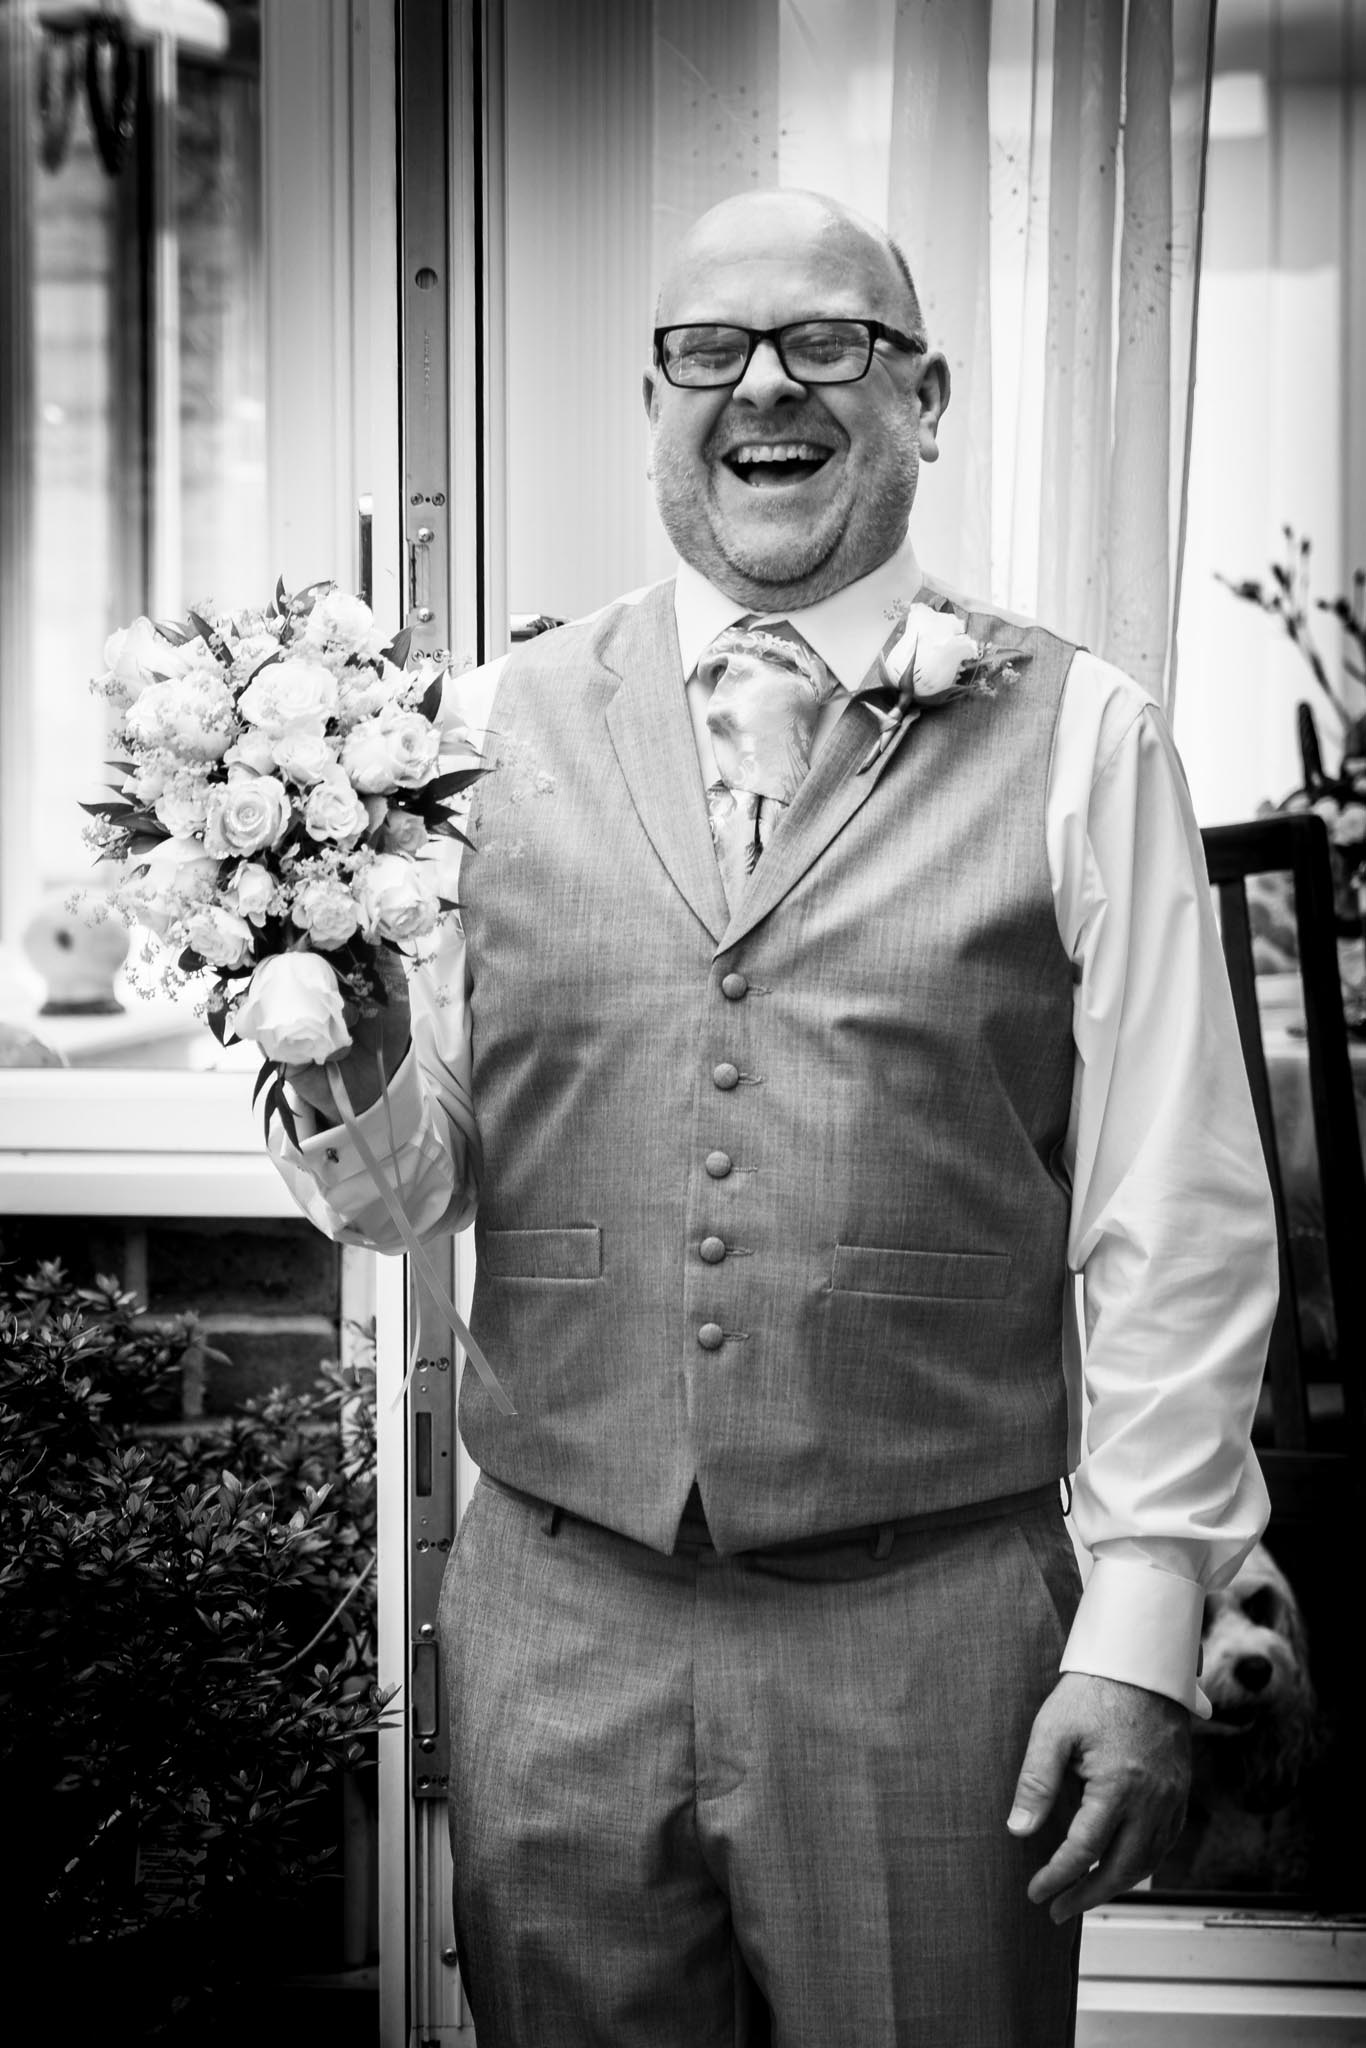 078-Preparations-Luke-Yasmin-The-Rayleigh-Club-Wedding-Photography.jpg